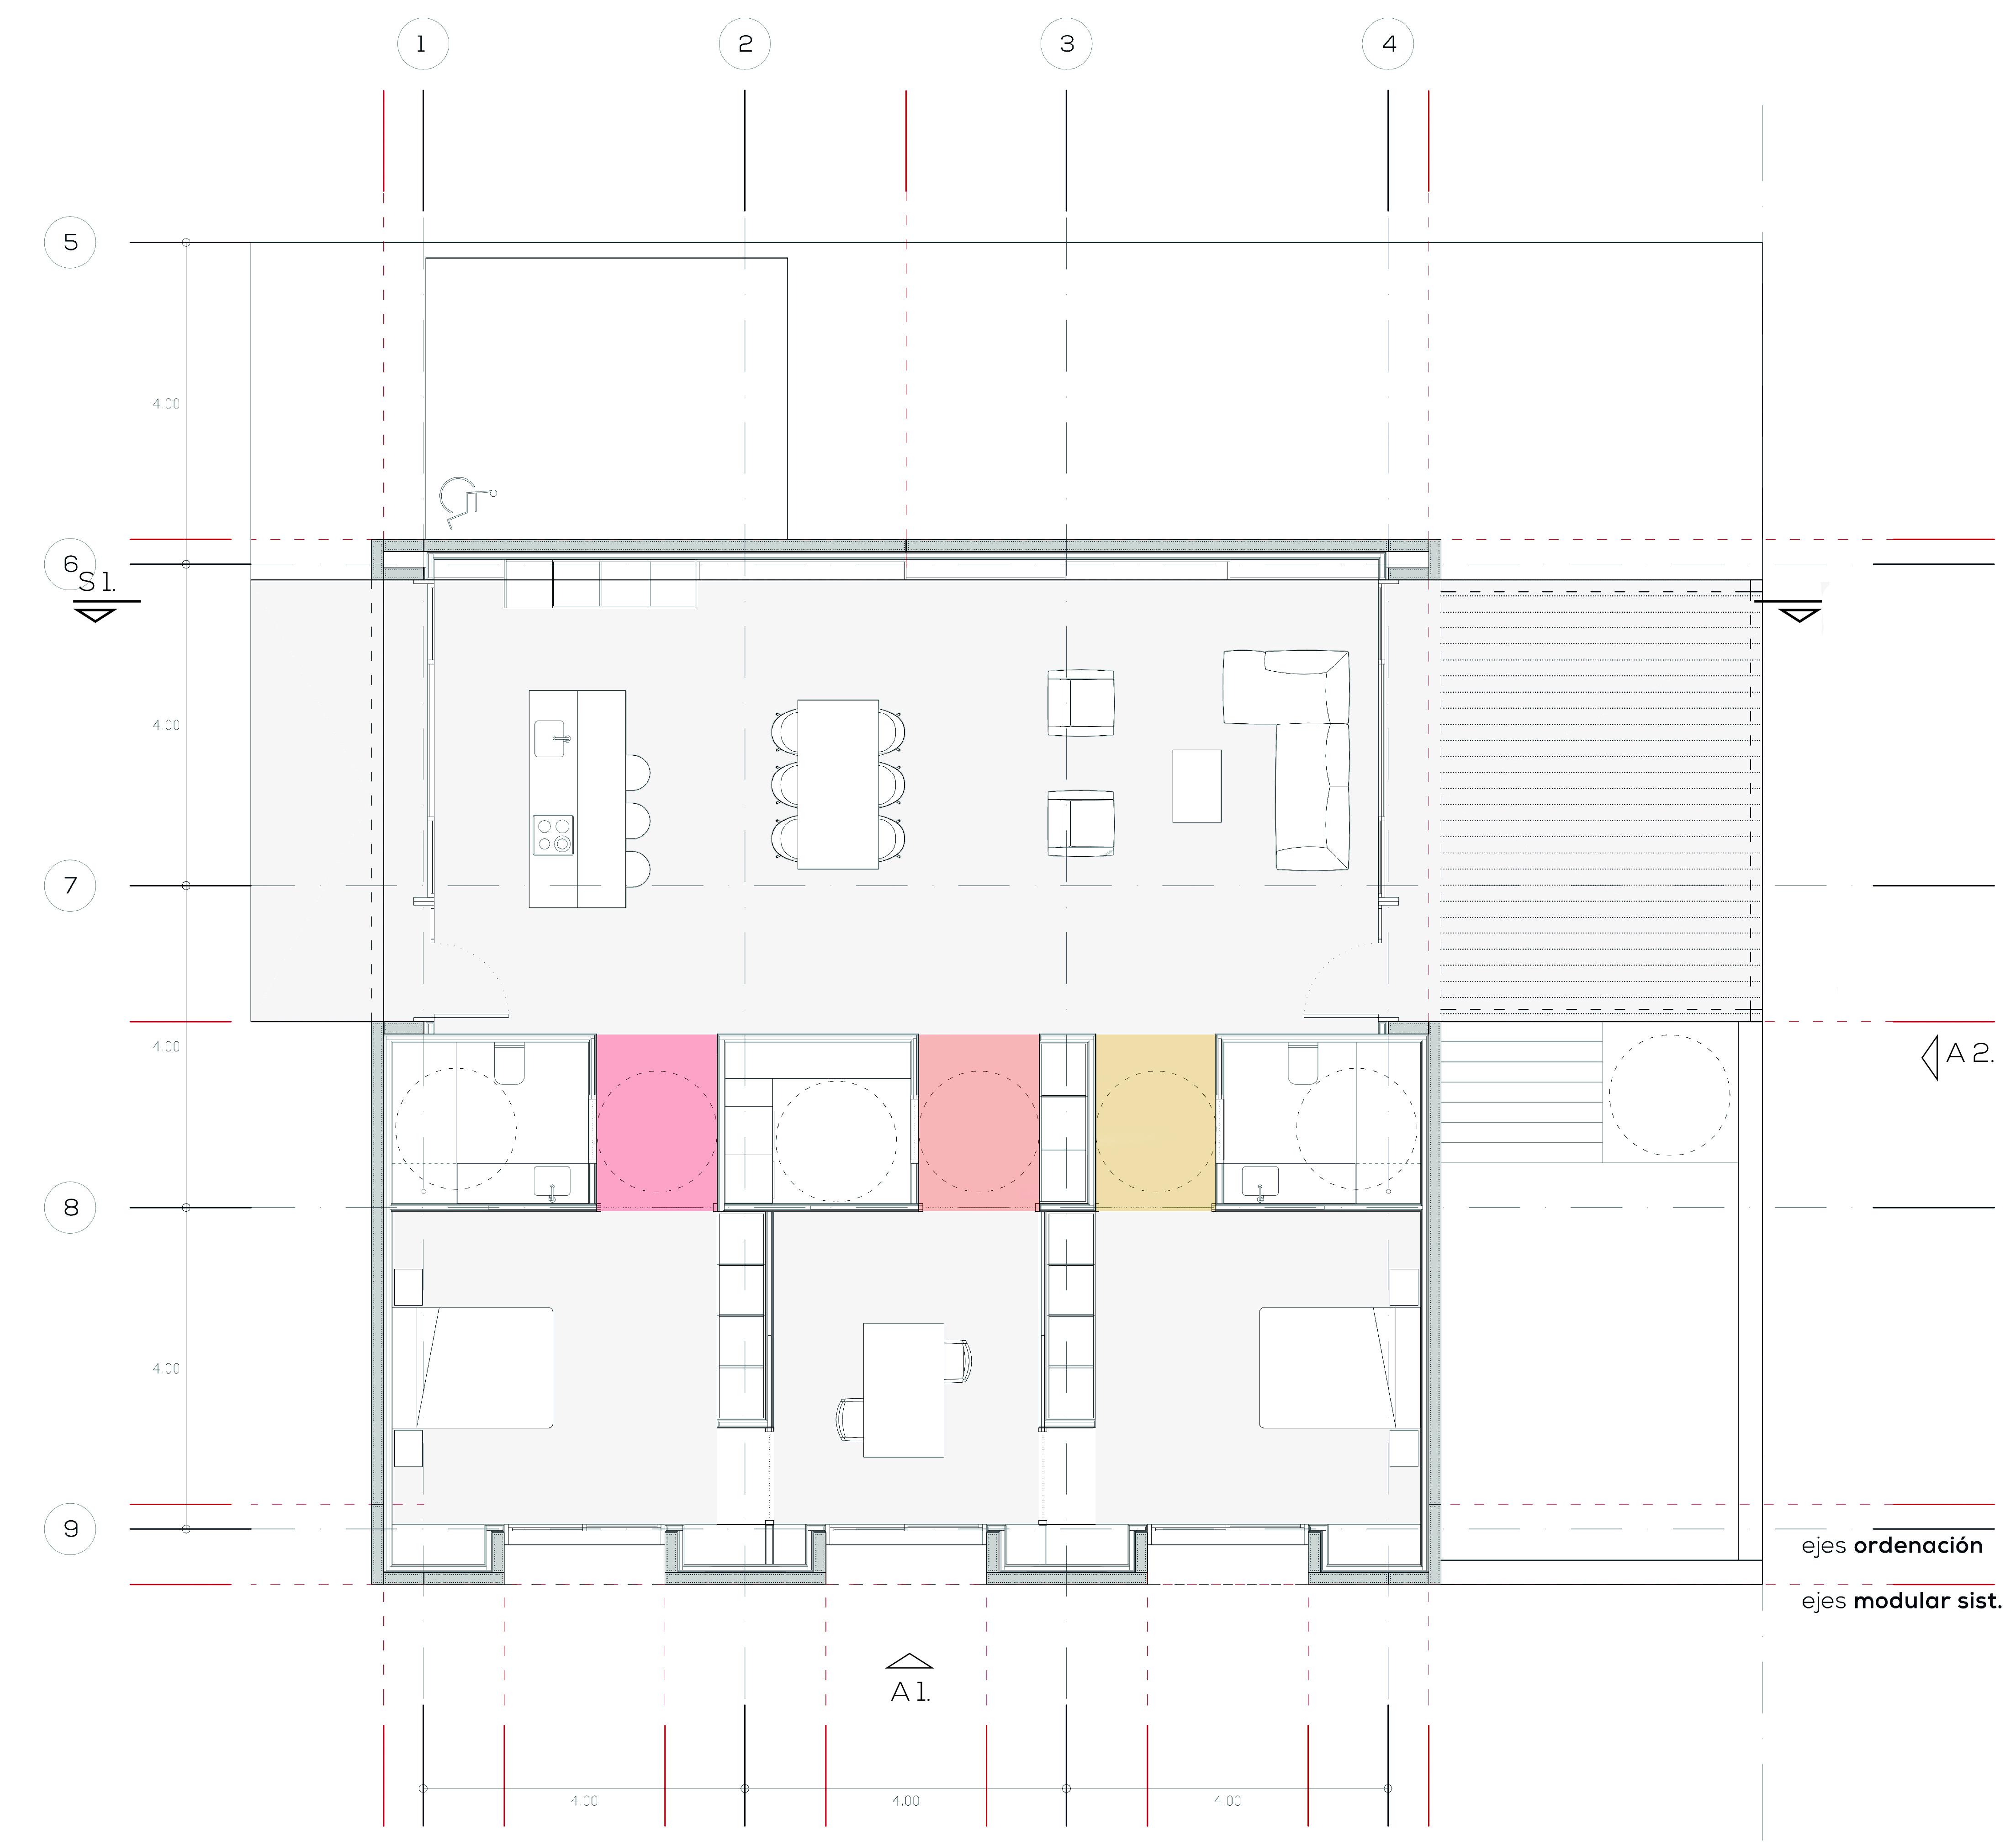 Estudio13_CasaM-Modular Home Adapta-Planta